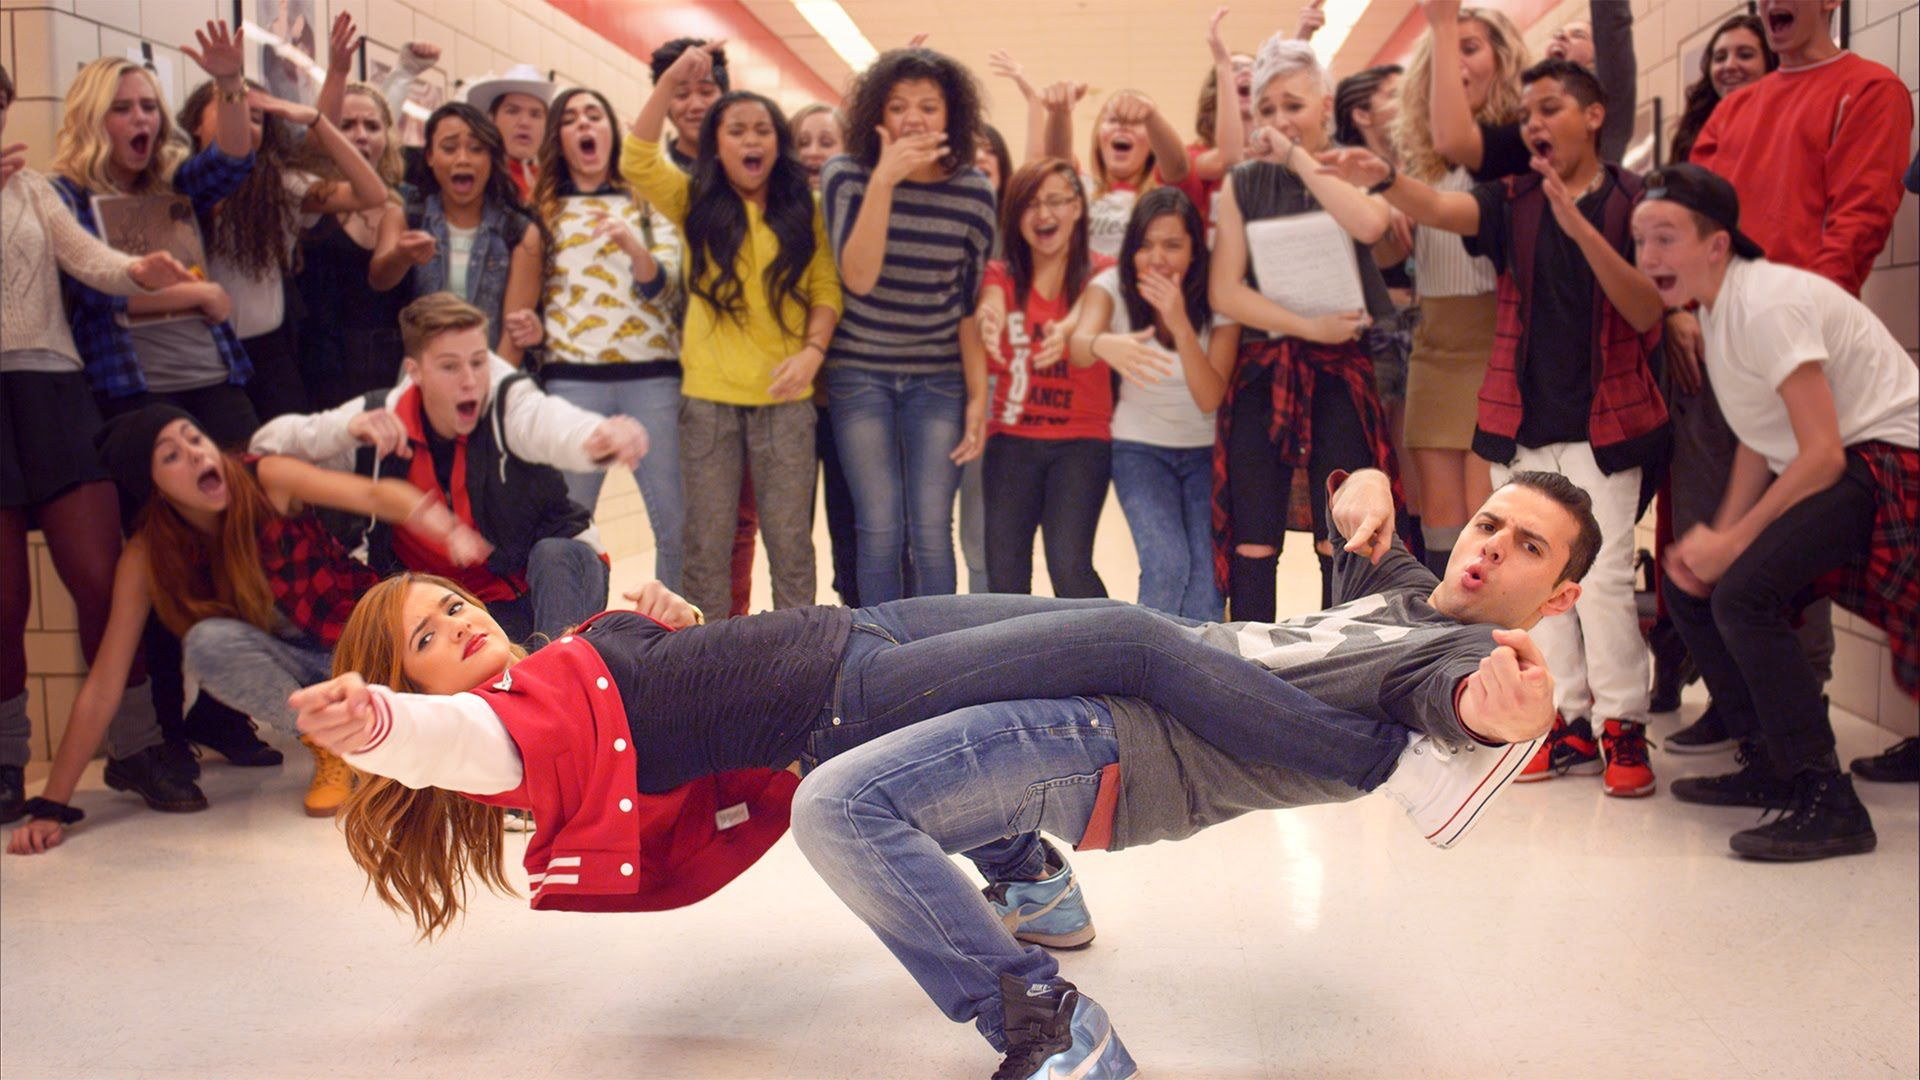 High School Dance Battle - Geeks Vs Cool Kids 4K  Dance Aholics -8840